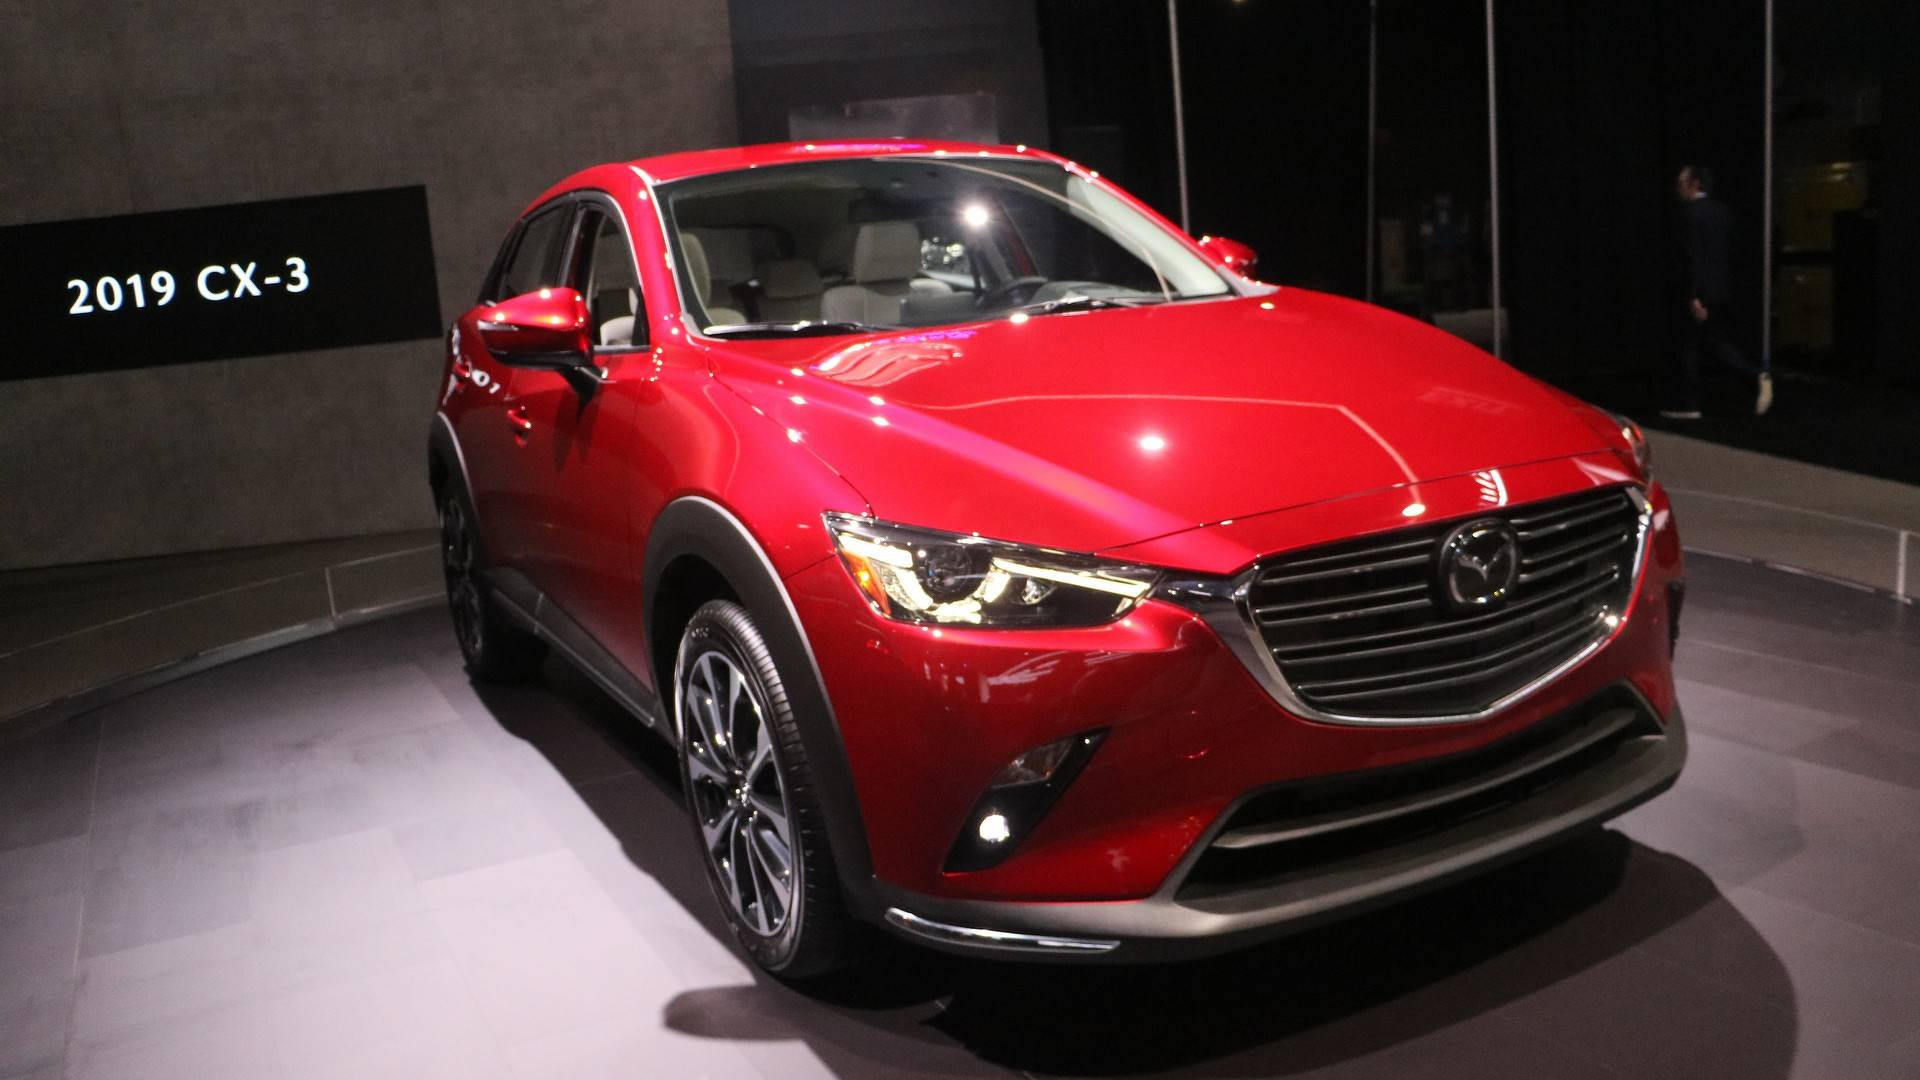 Нью-Йорк 2018: Mazda обновила кроссовер CX-3